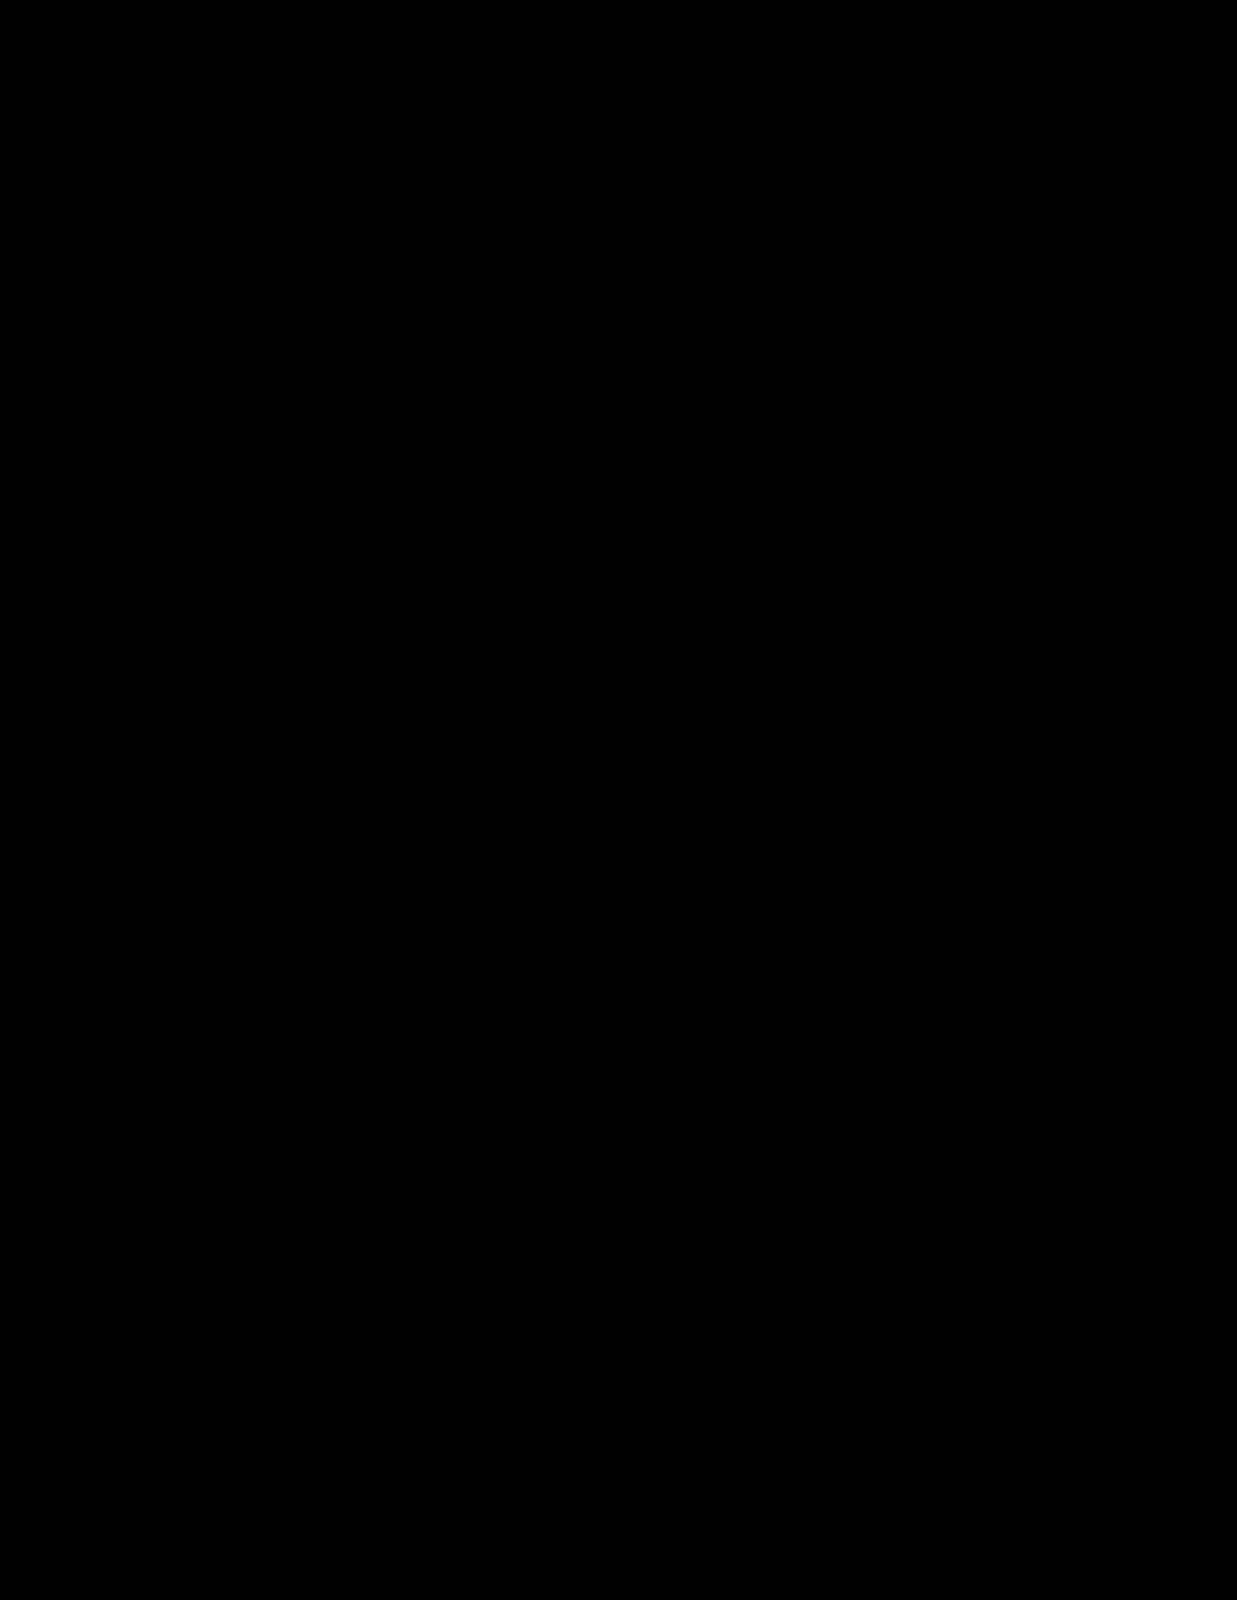 clip transparent stock Doodle border clipart